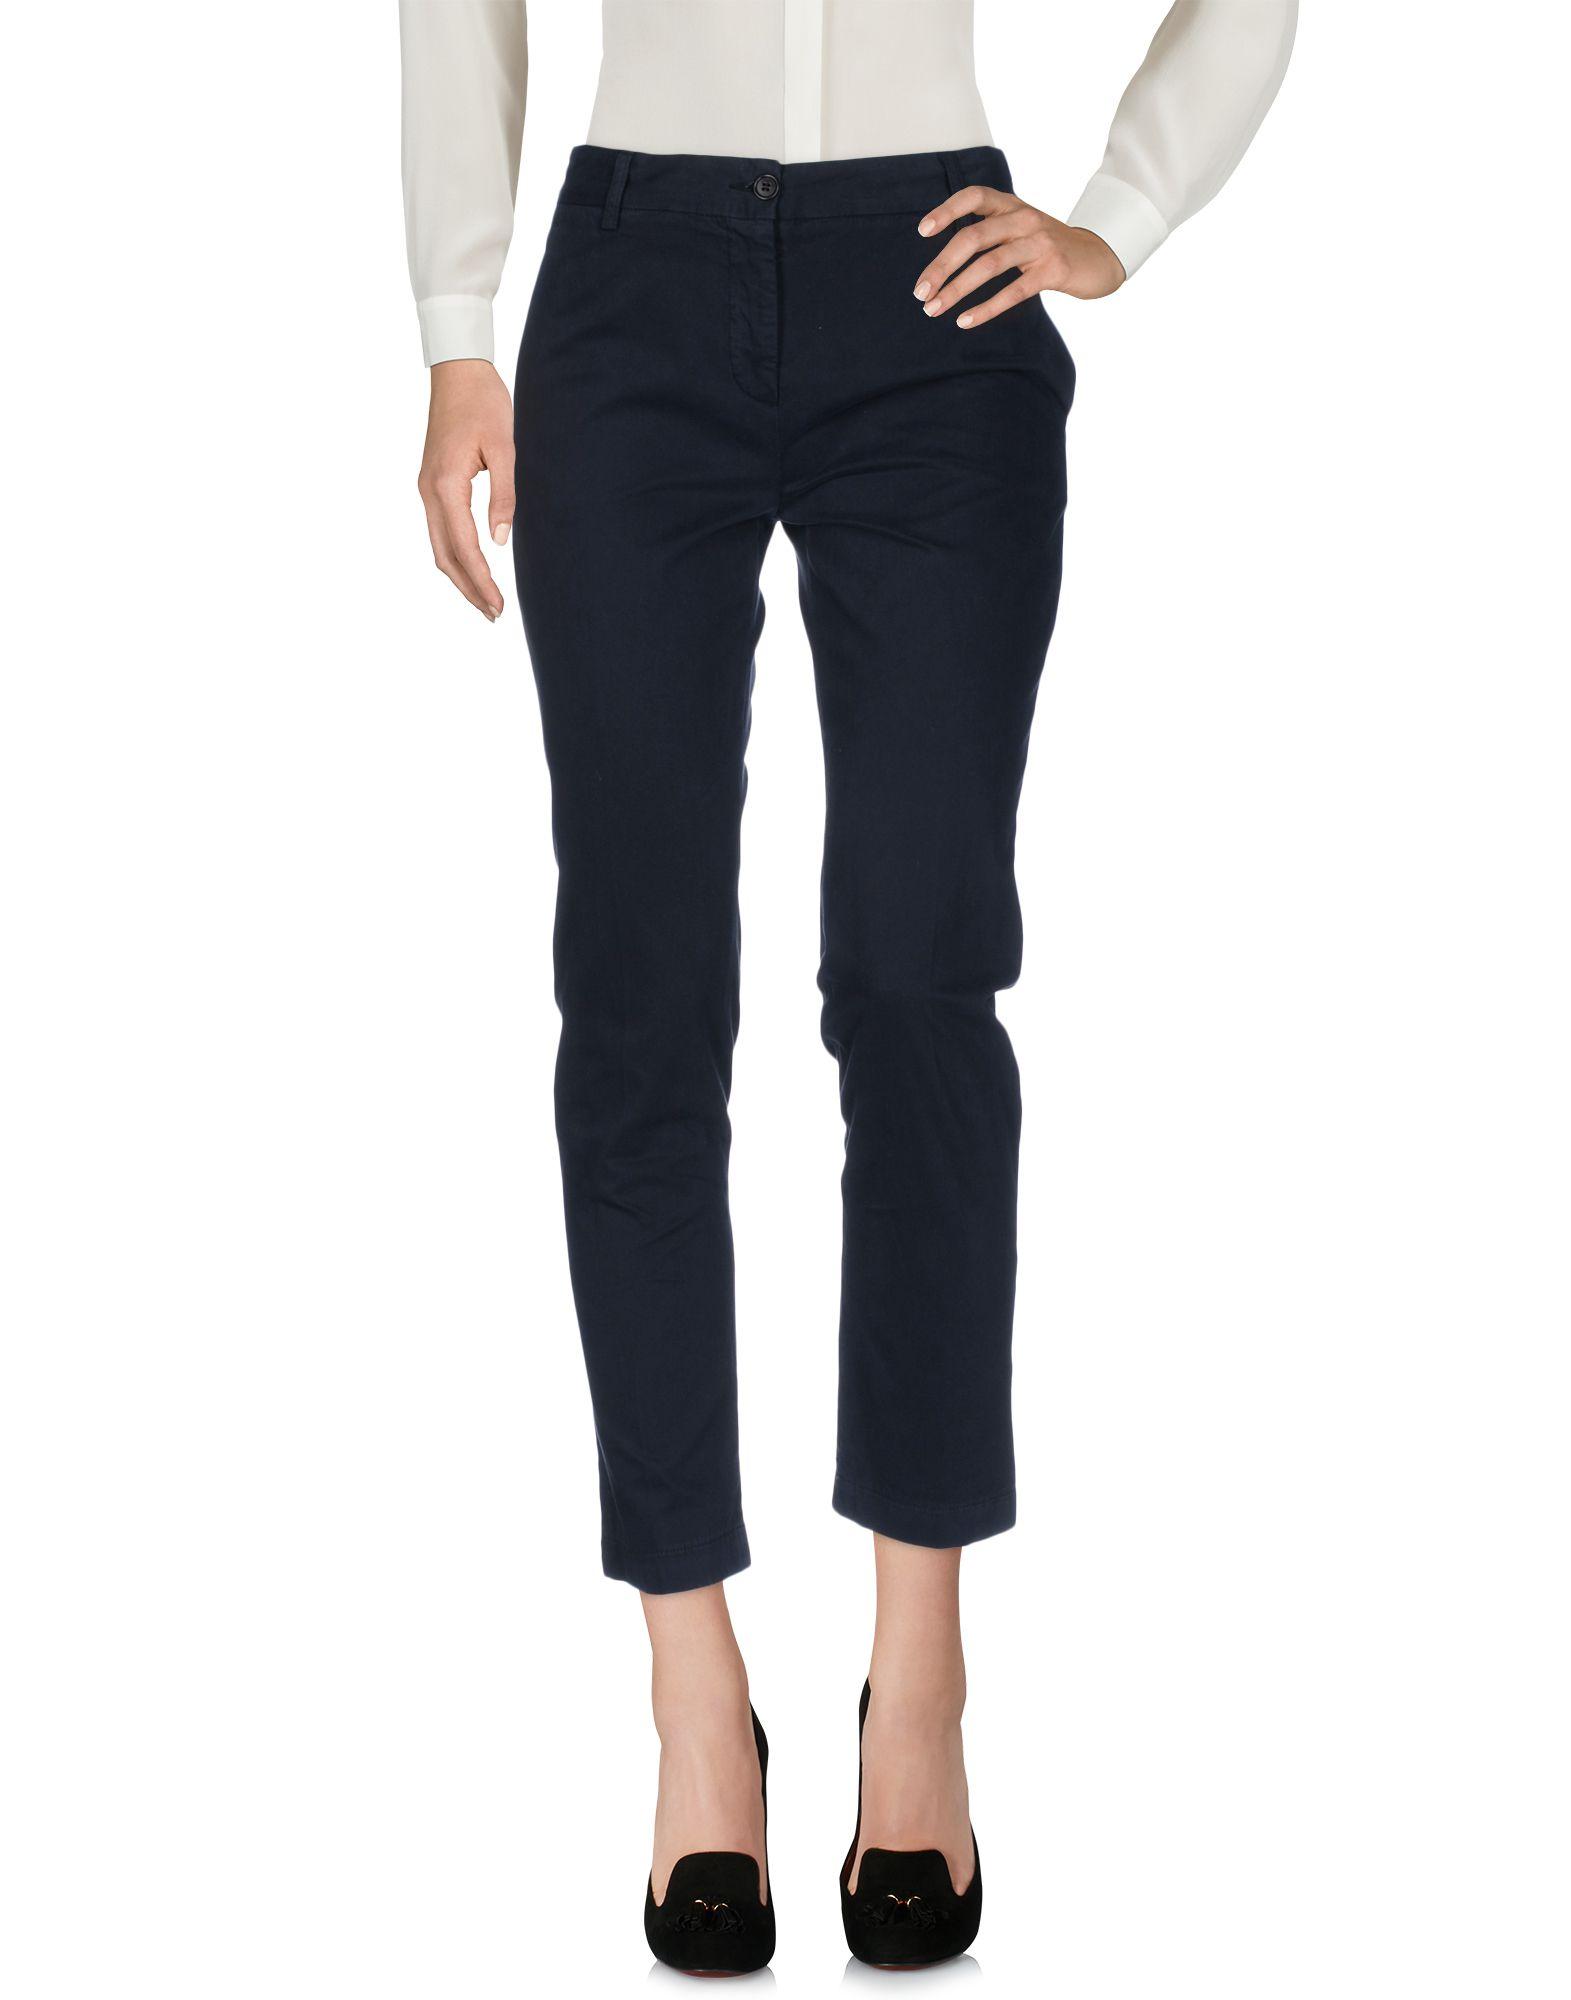 ASPESI Damen Hose Farbe Dunkelblau Größe 3 - broschei